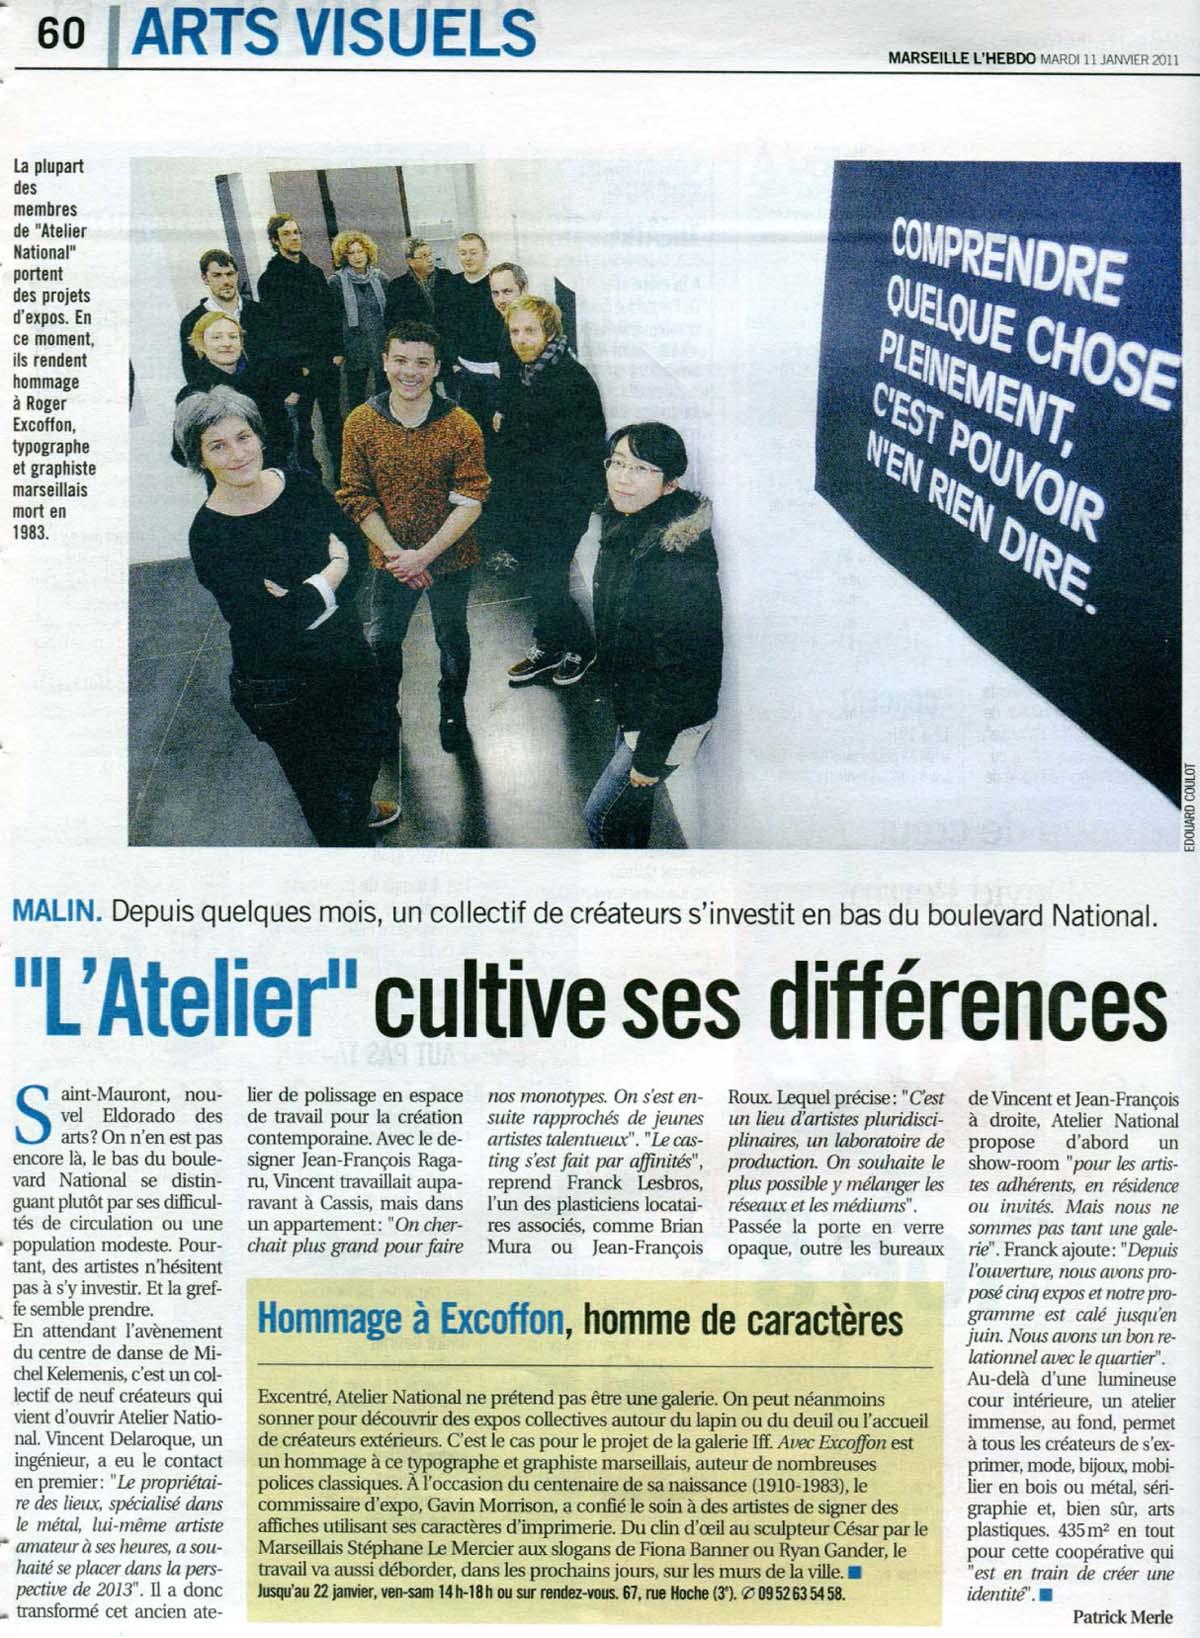 Marseille L'hebbdo & AtelieRnaTional